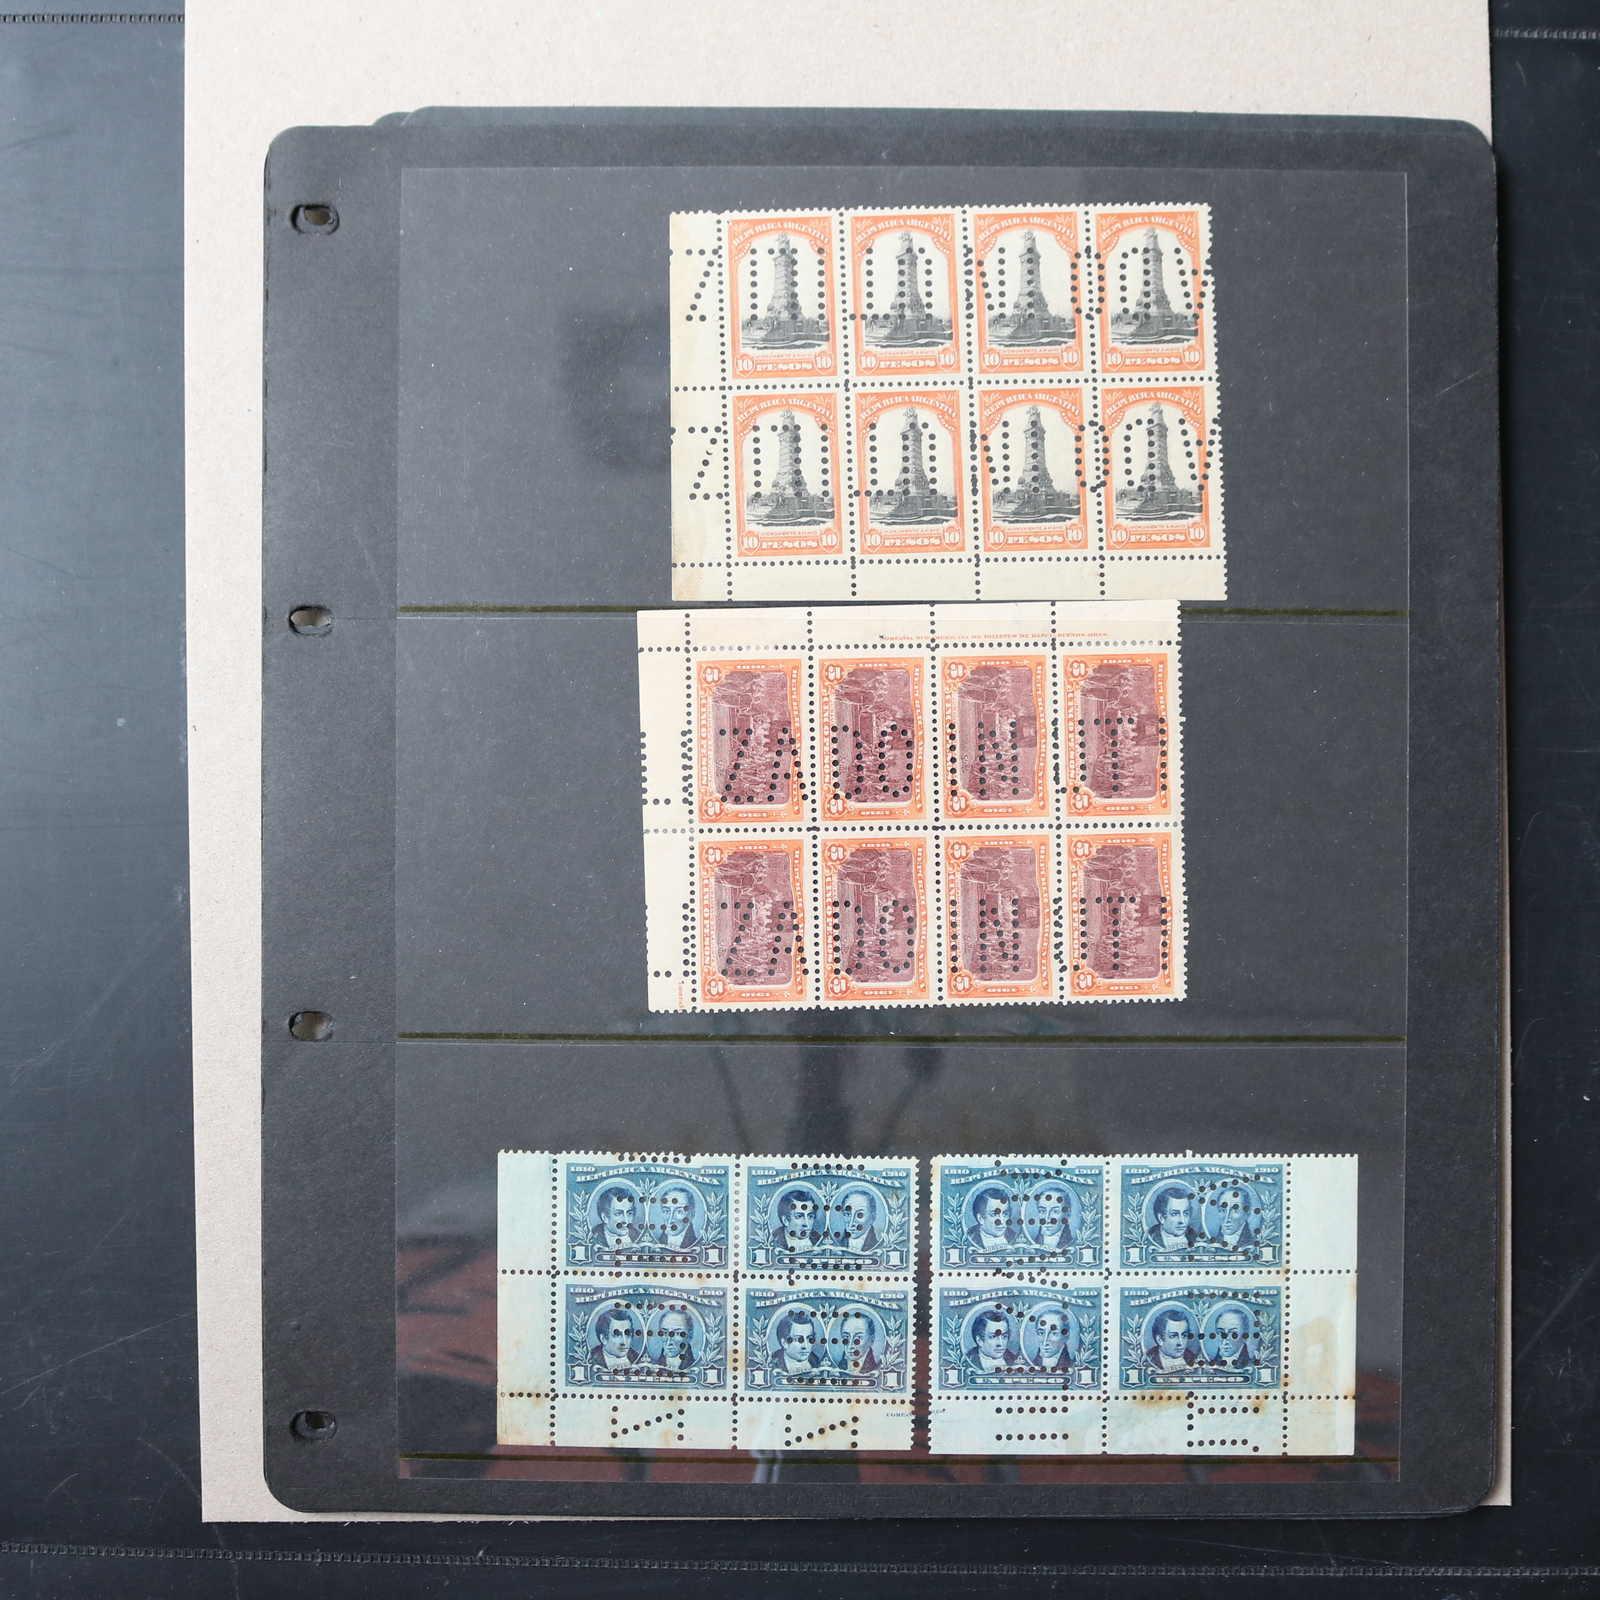 Lot 2734 - COLLECTIONS & ACCUMULATIONS Argentina -  Auktionshaus Schlegel 26 Public Auction